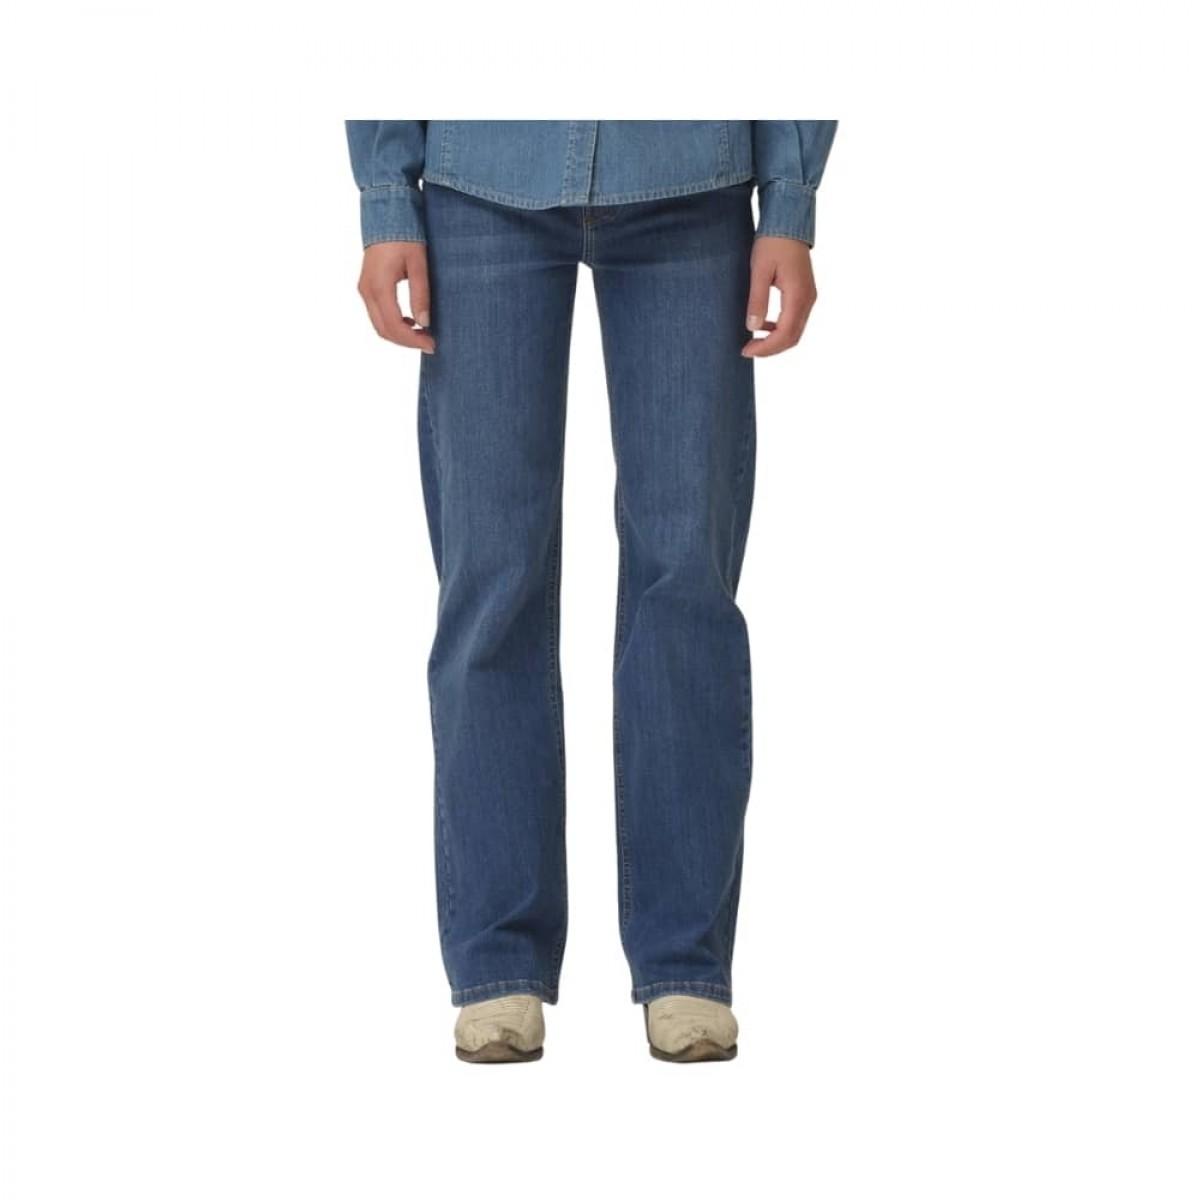 brown straight jeans - denim blue - ben detalje